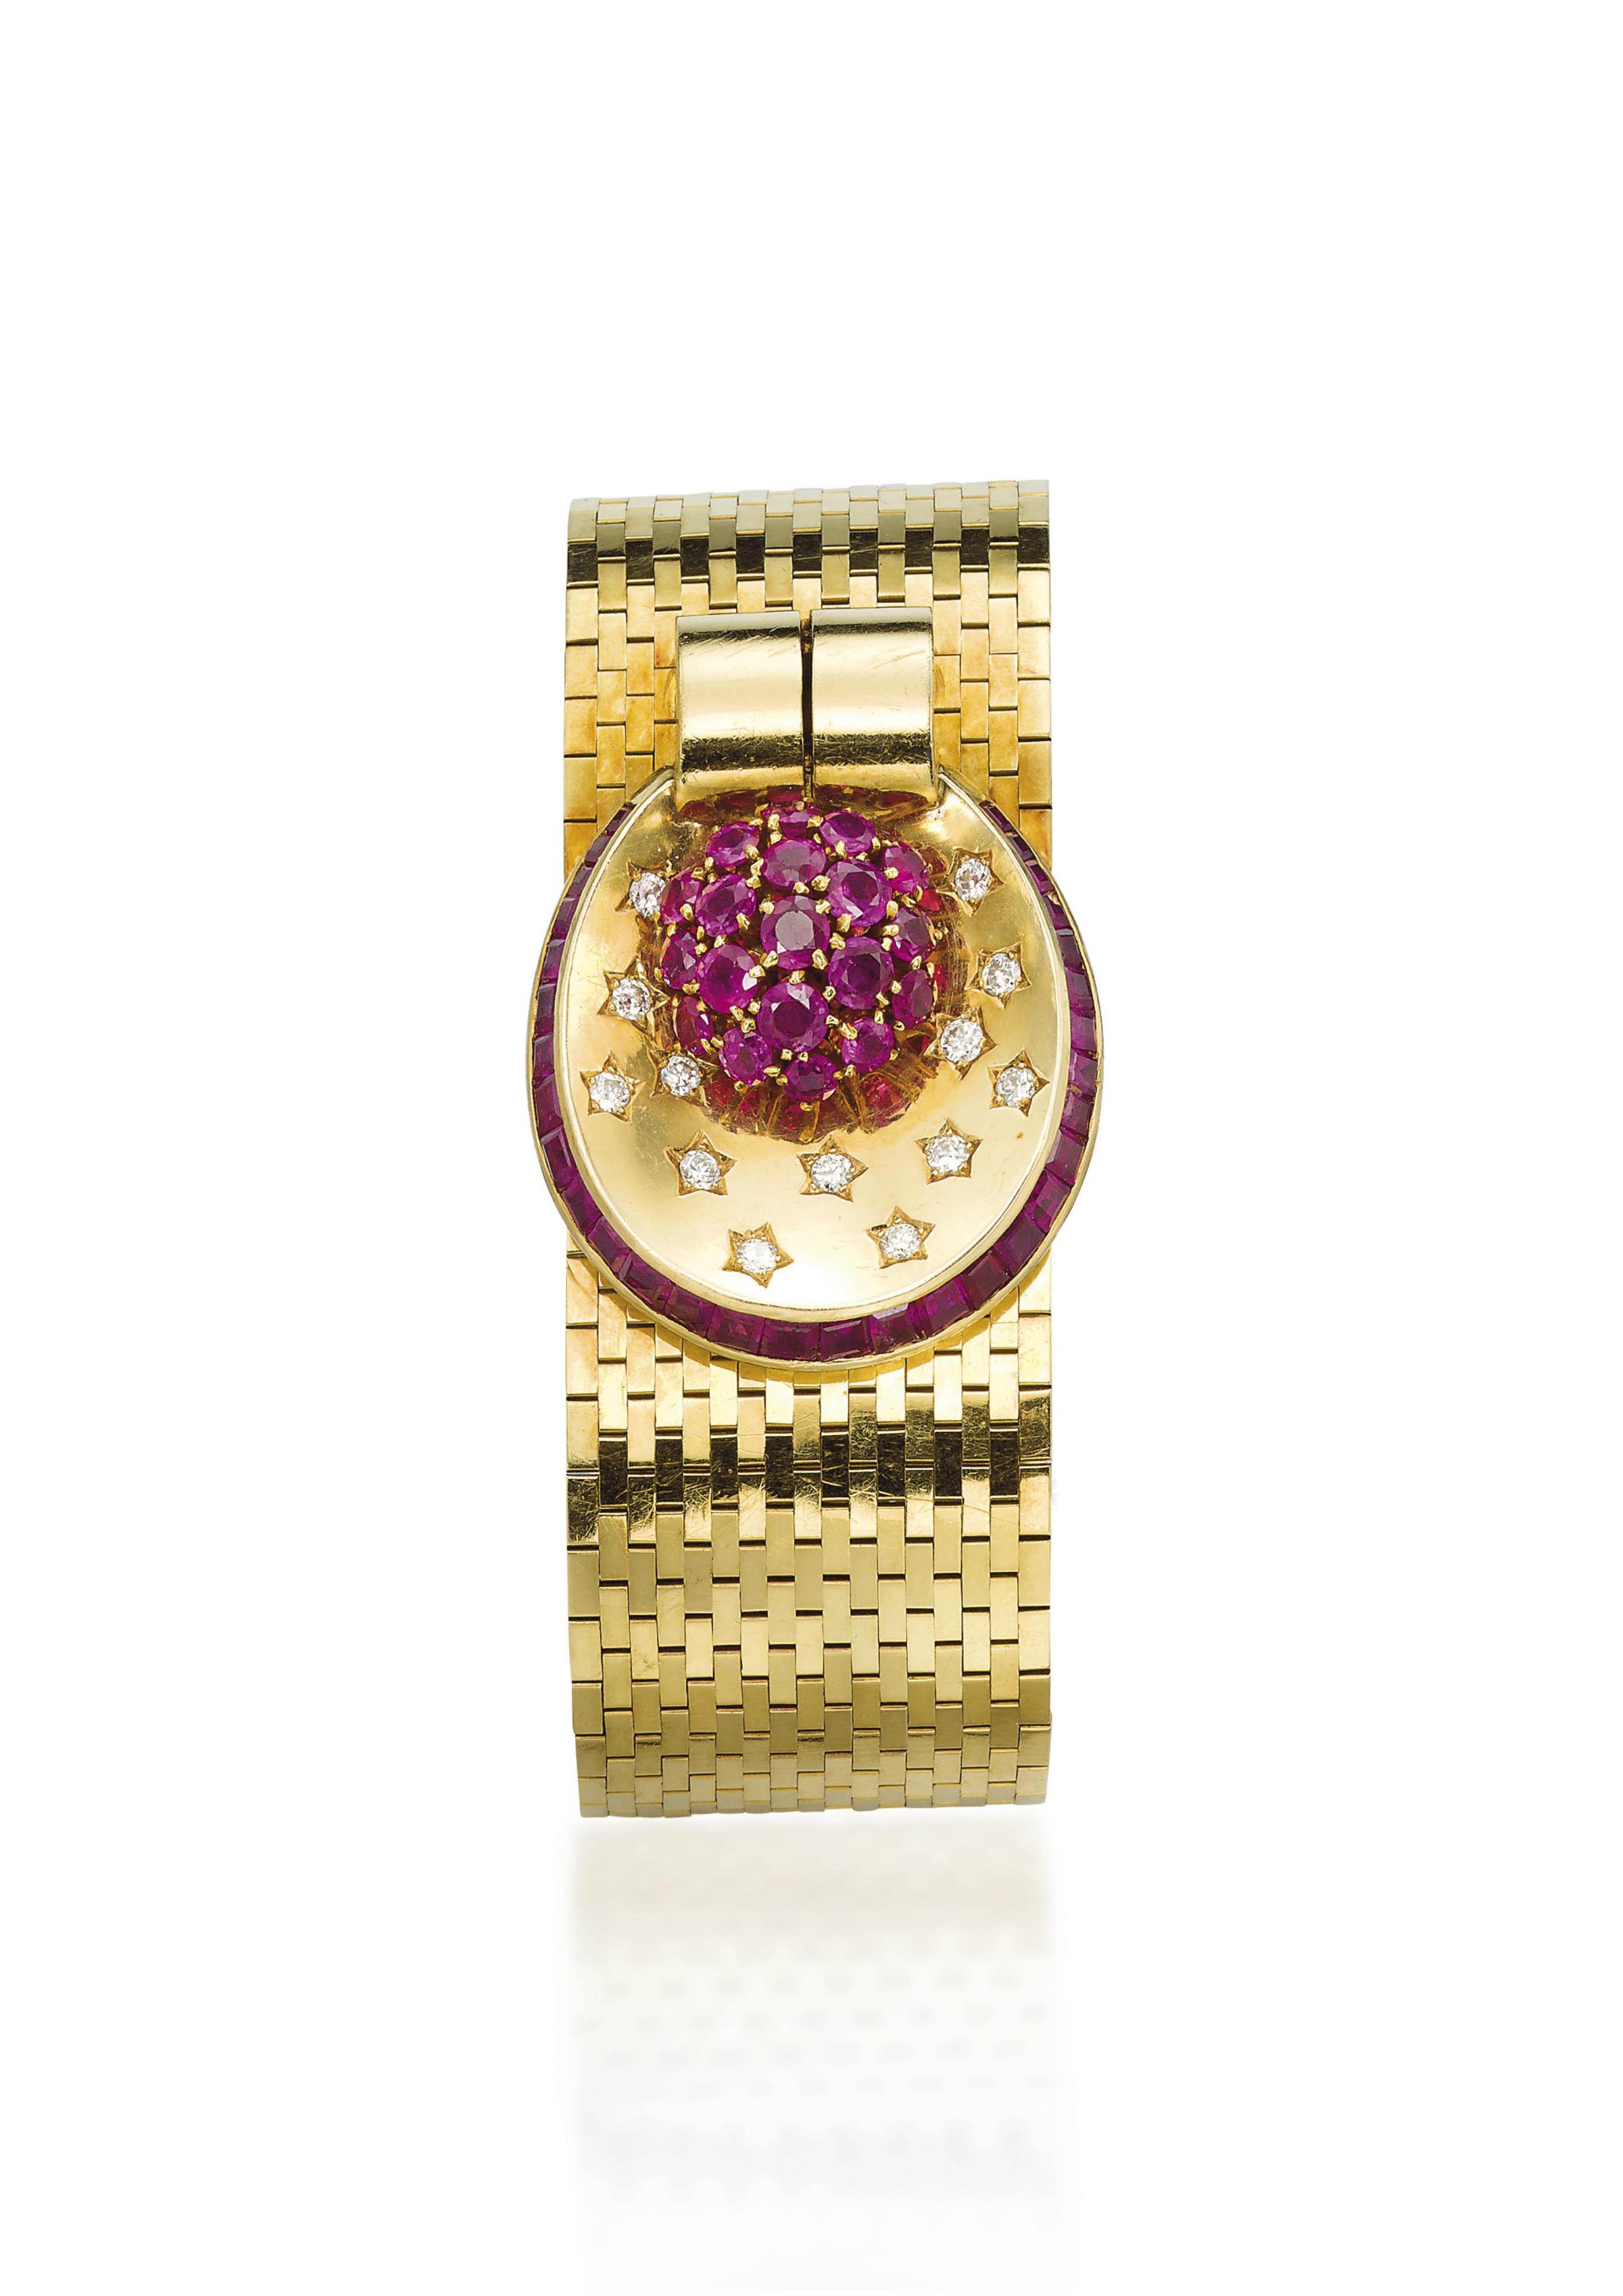 A RETRO RUBY, DIAMOND AND GOLD